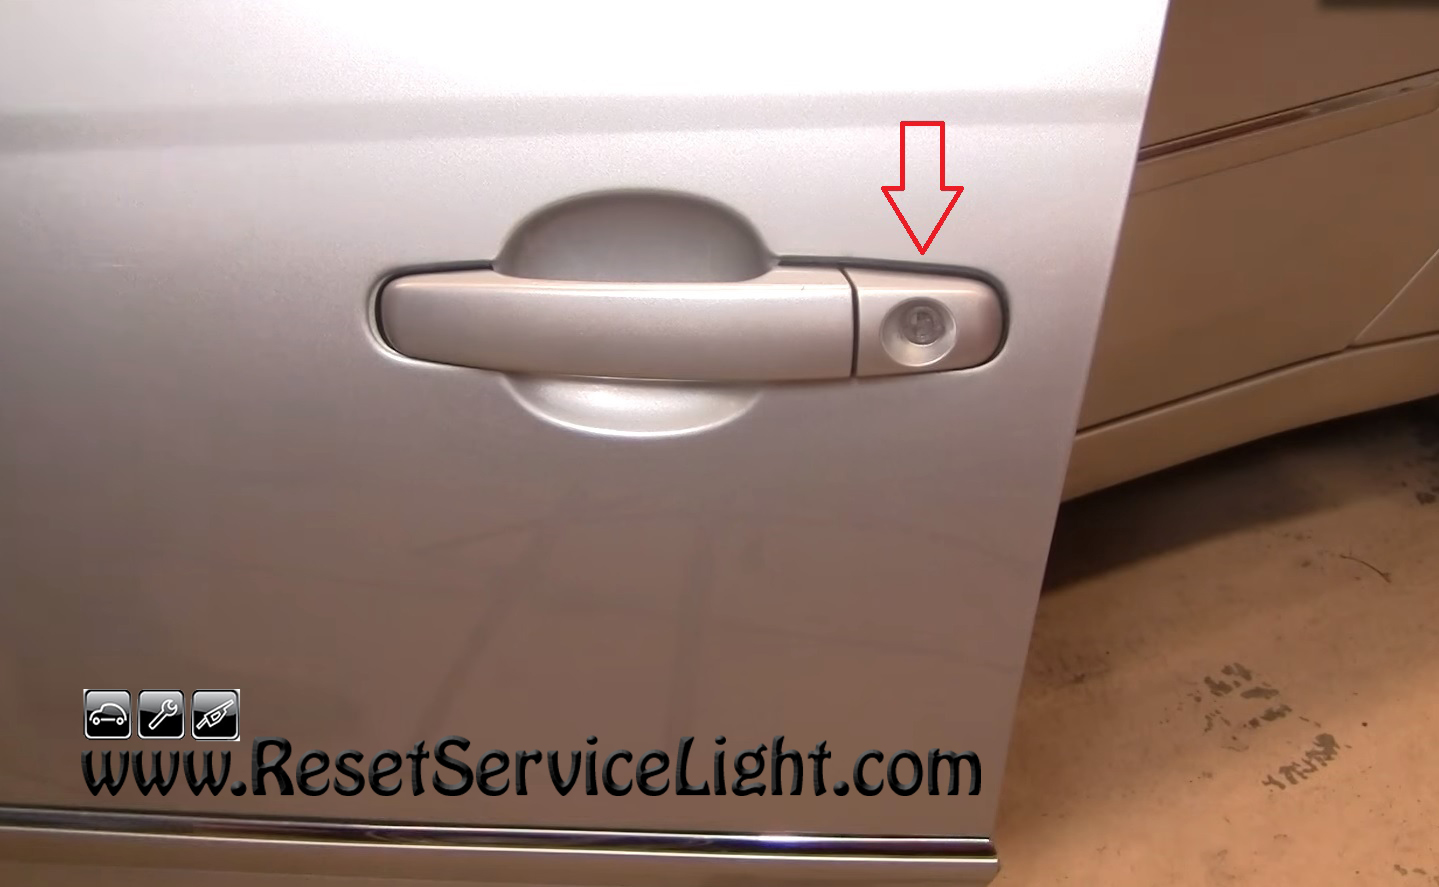 Diy Change The Exterior Door Handle On Chevy Malibu 2004 2008 Reset Service Light Reset Oil Life Maintenance Light Reset